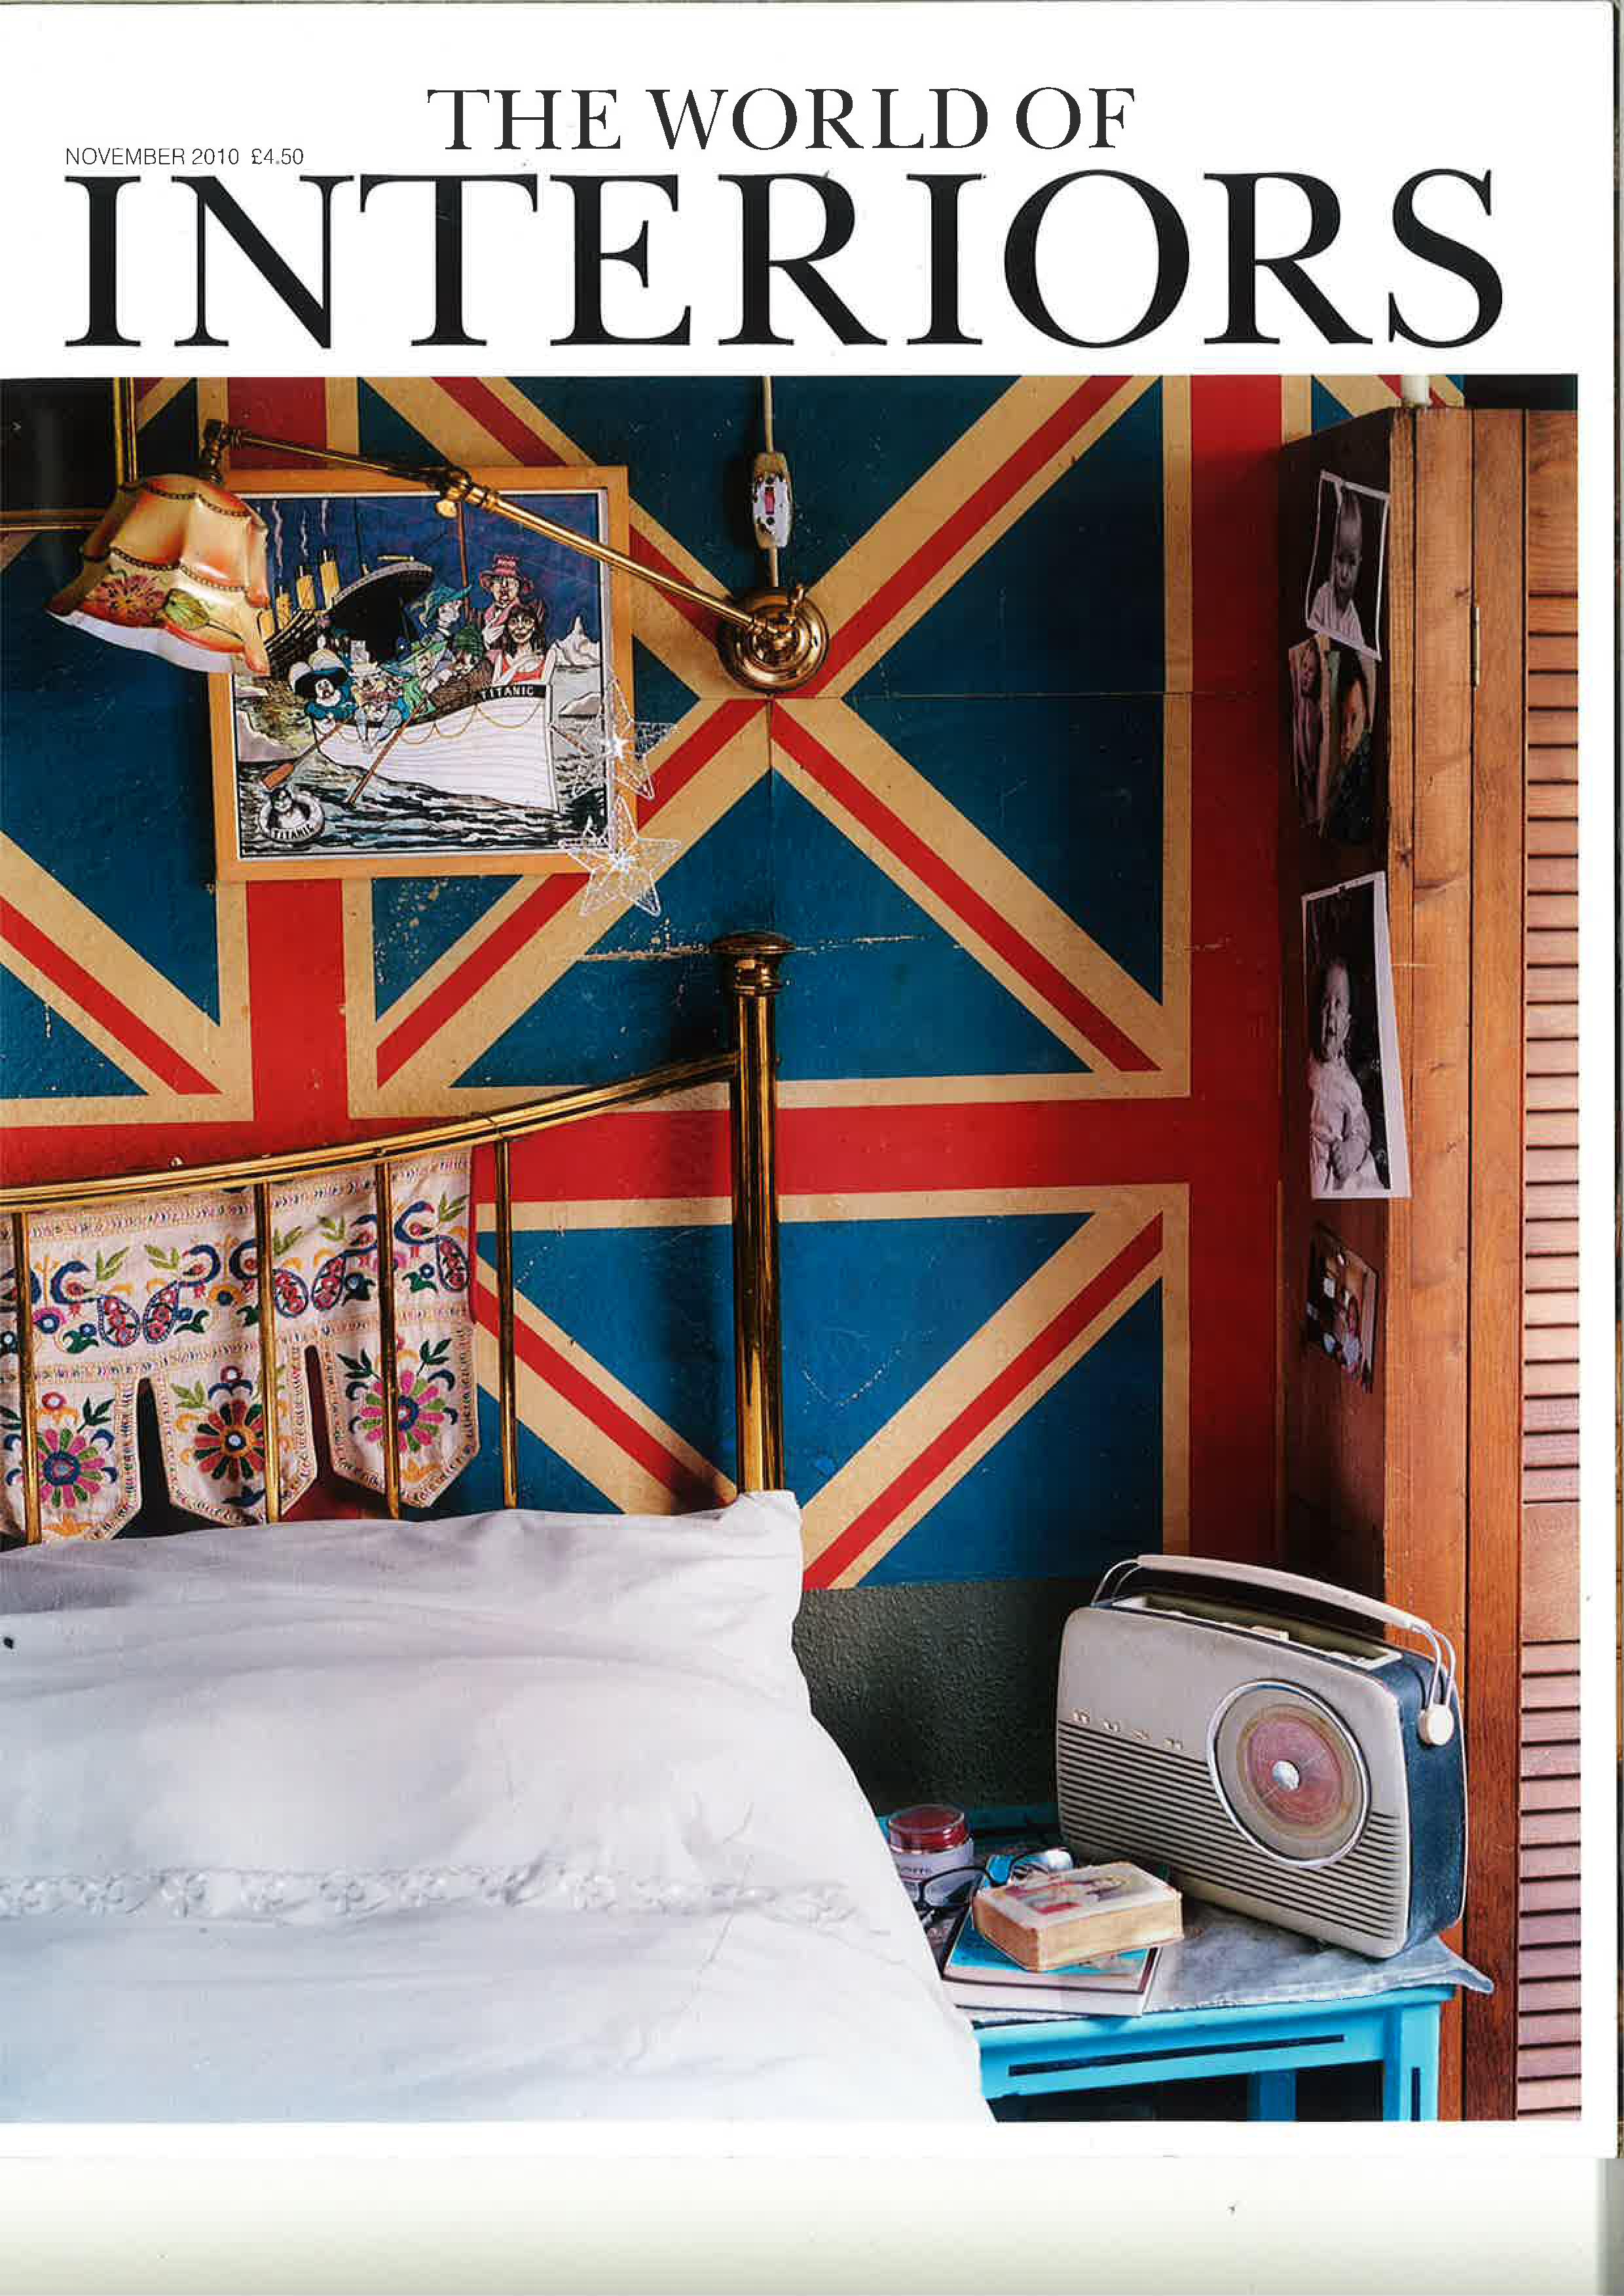 World of Interiors - November 2010